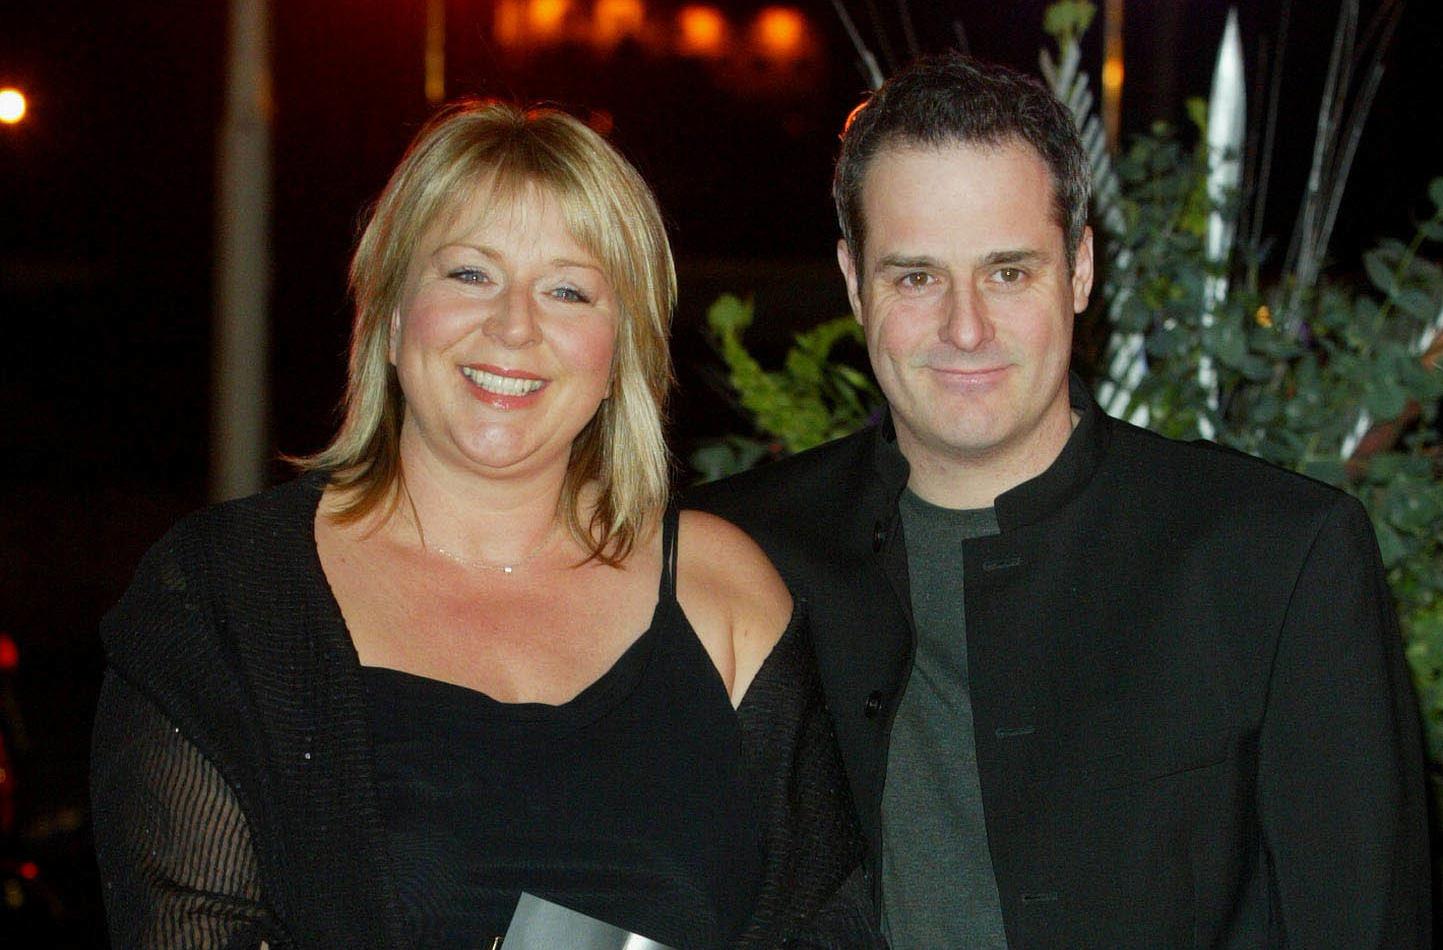 Fern Britton and Phil Vickery